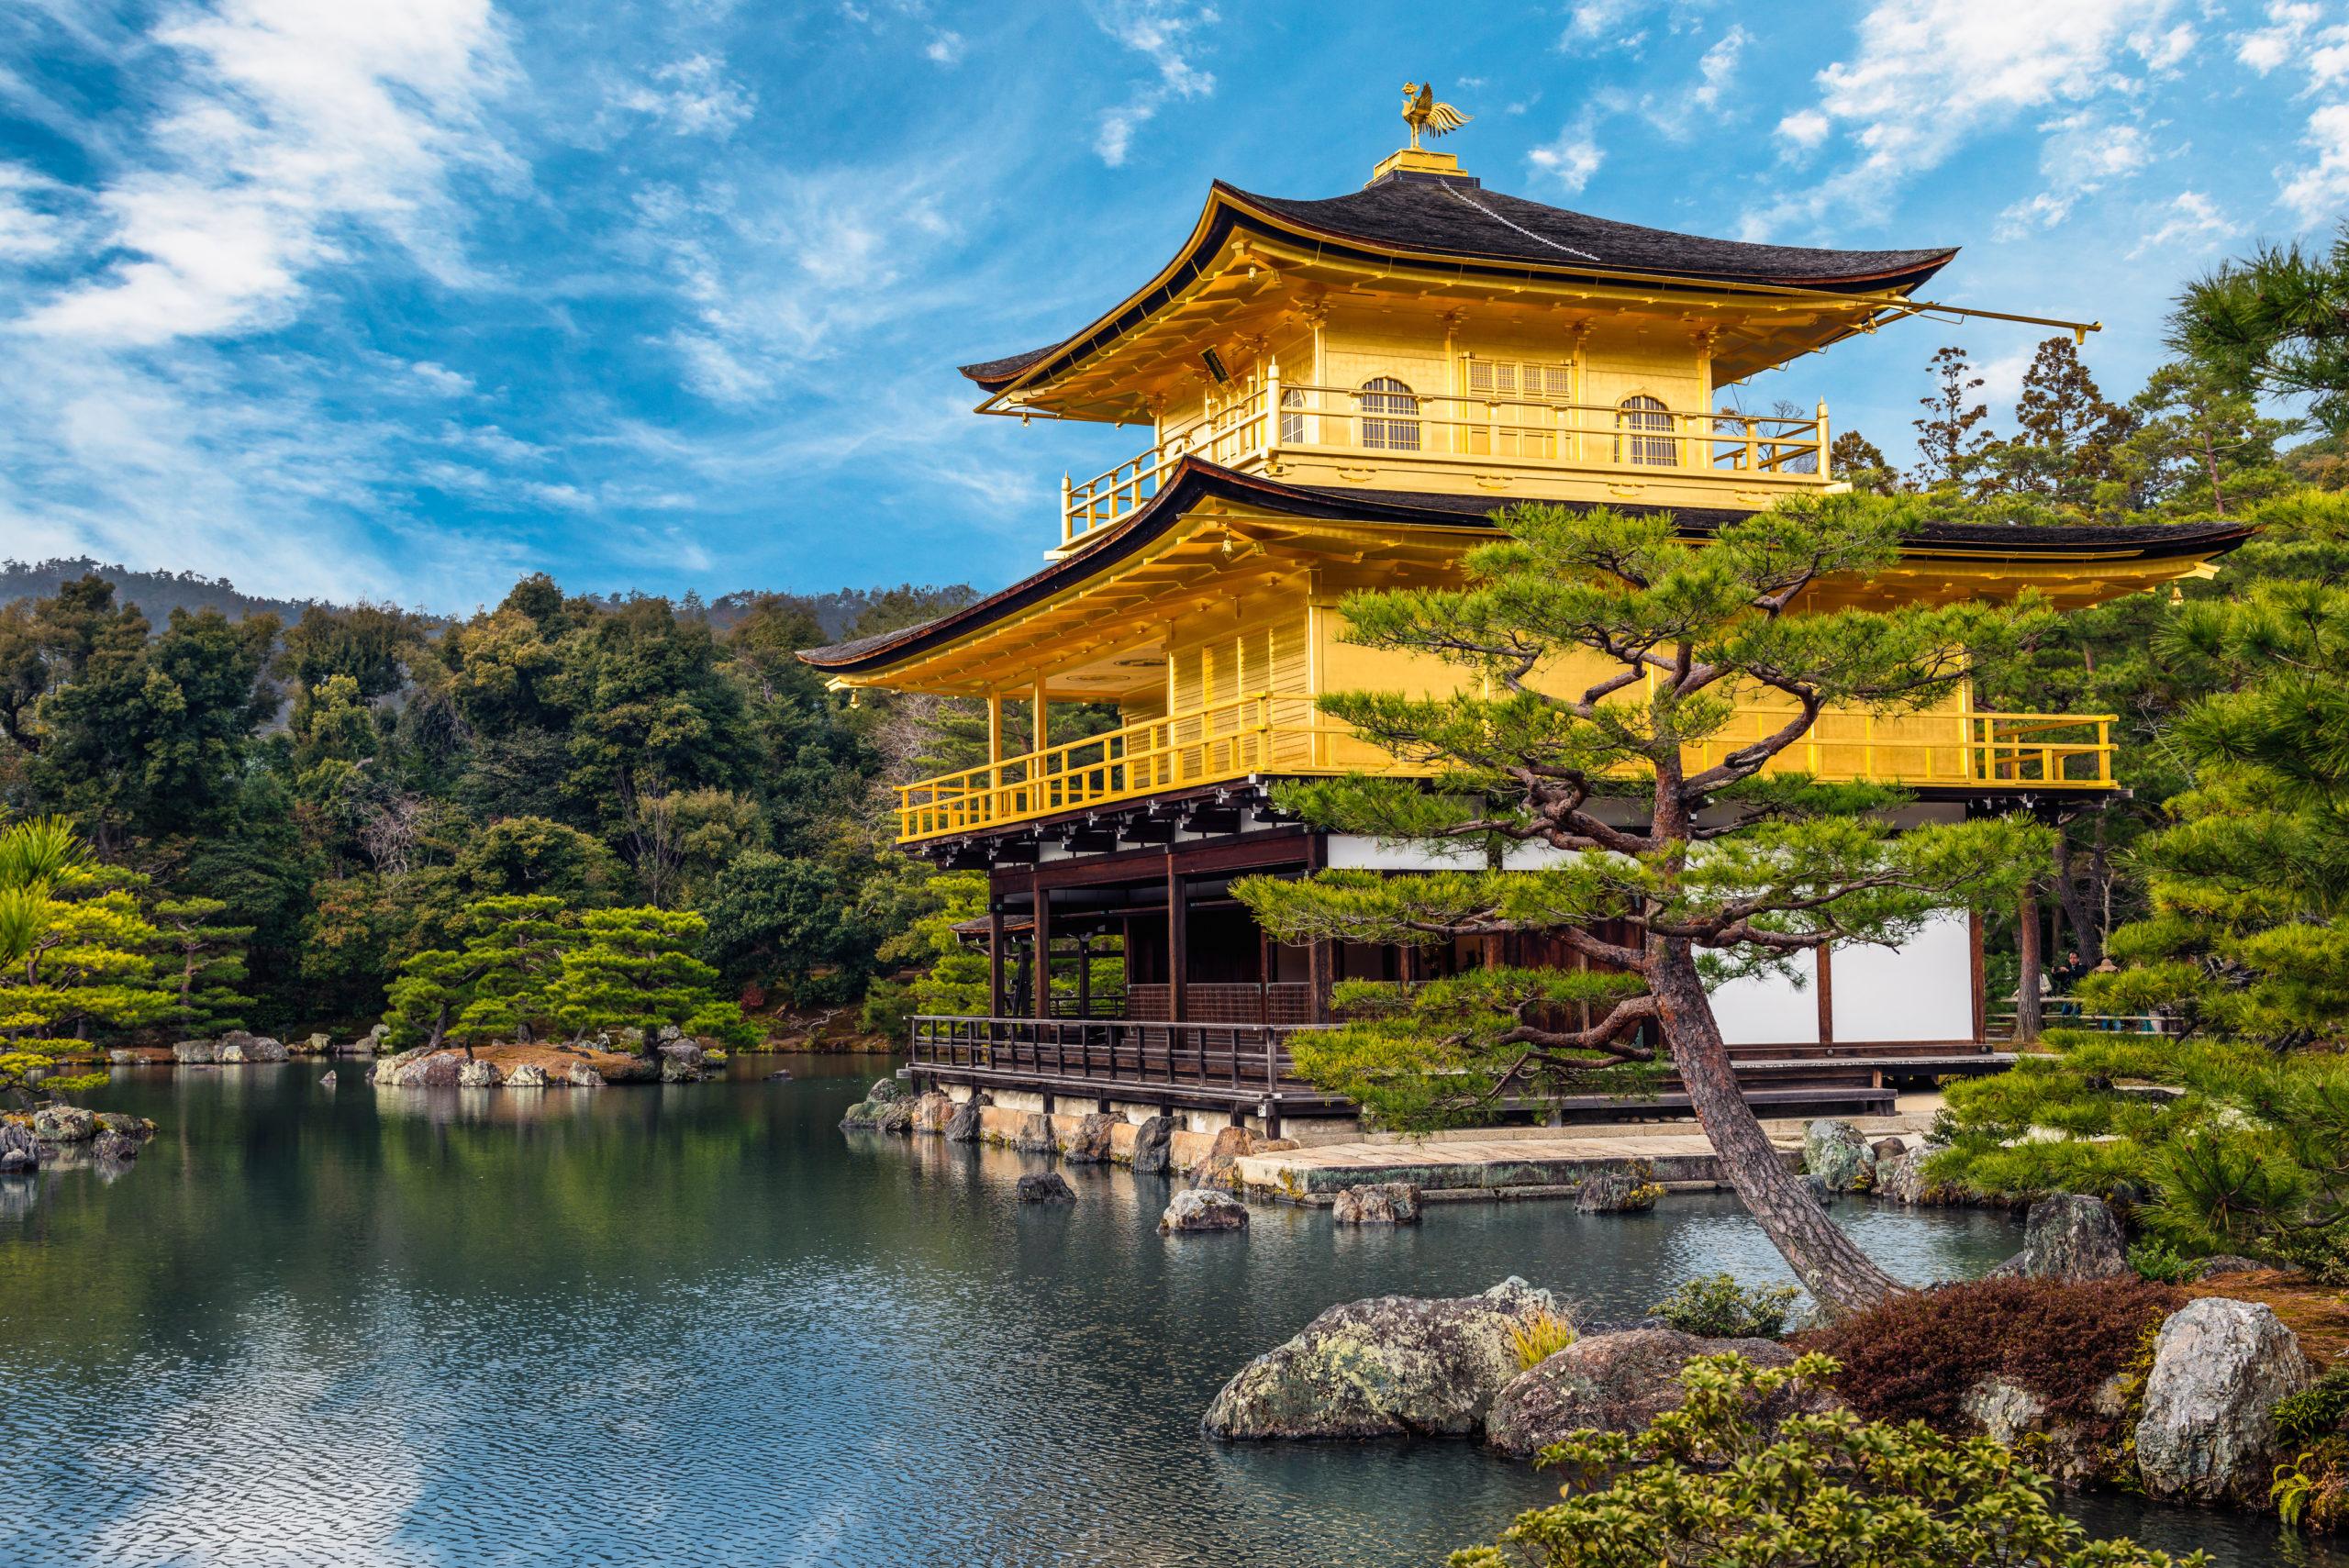 shutterstock_284085140_golden-pavilion-kinkaku-ji-of-kyoto-japan